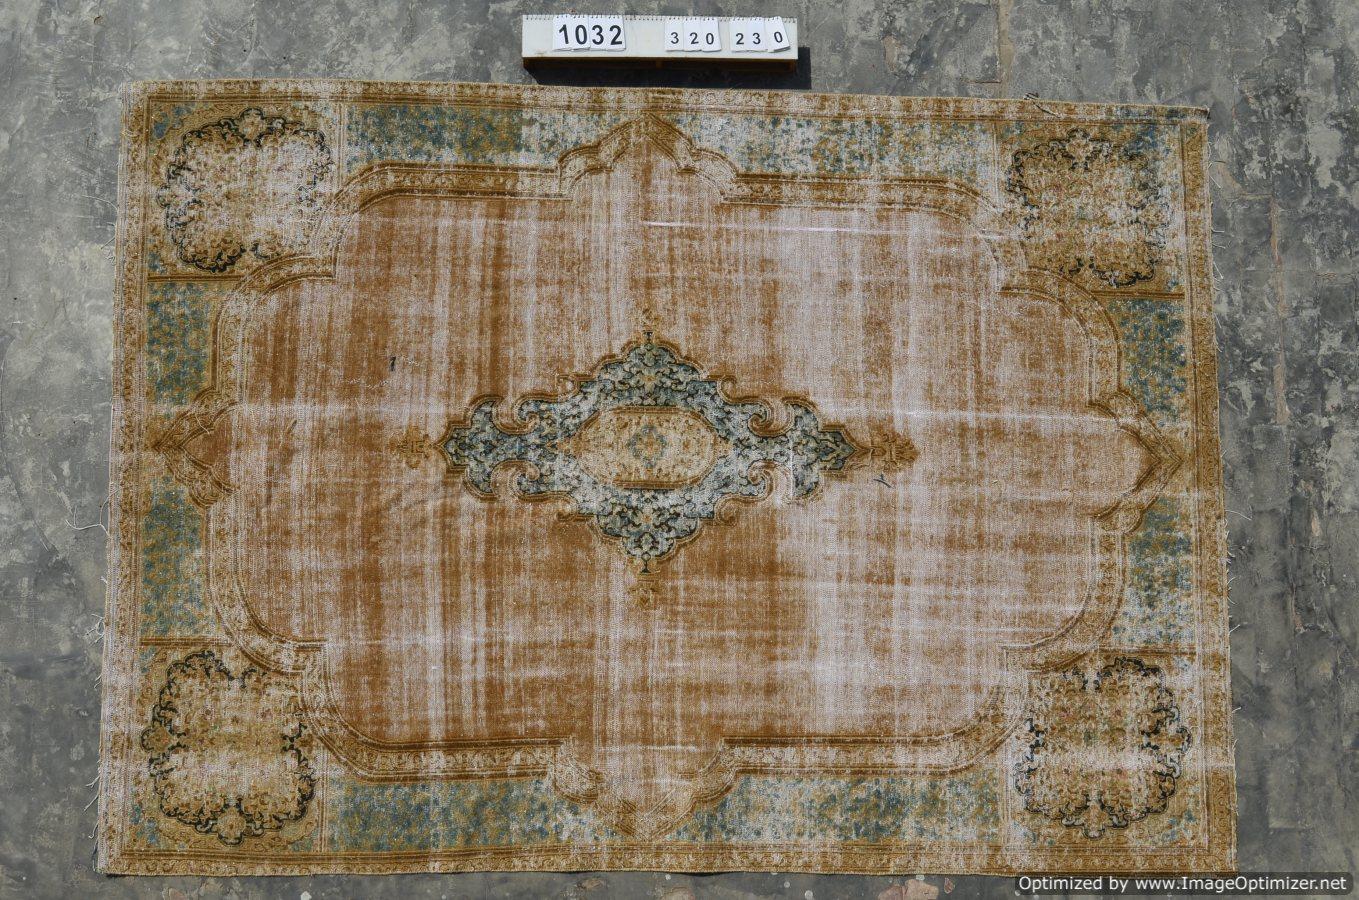 Zeer groot oud vloerkleed 1032 (320cm x 230cm) gereserveerd